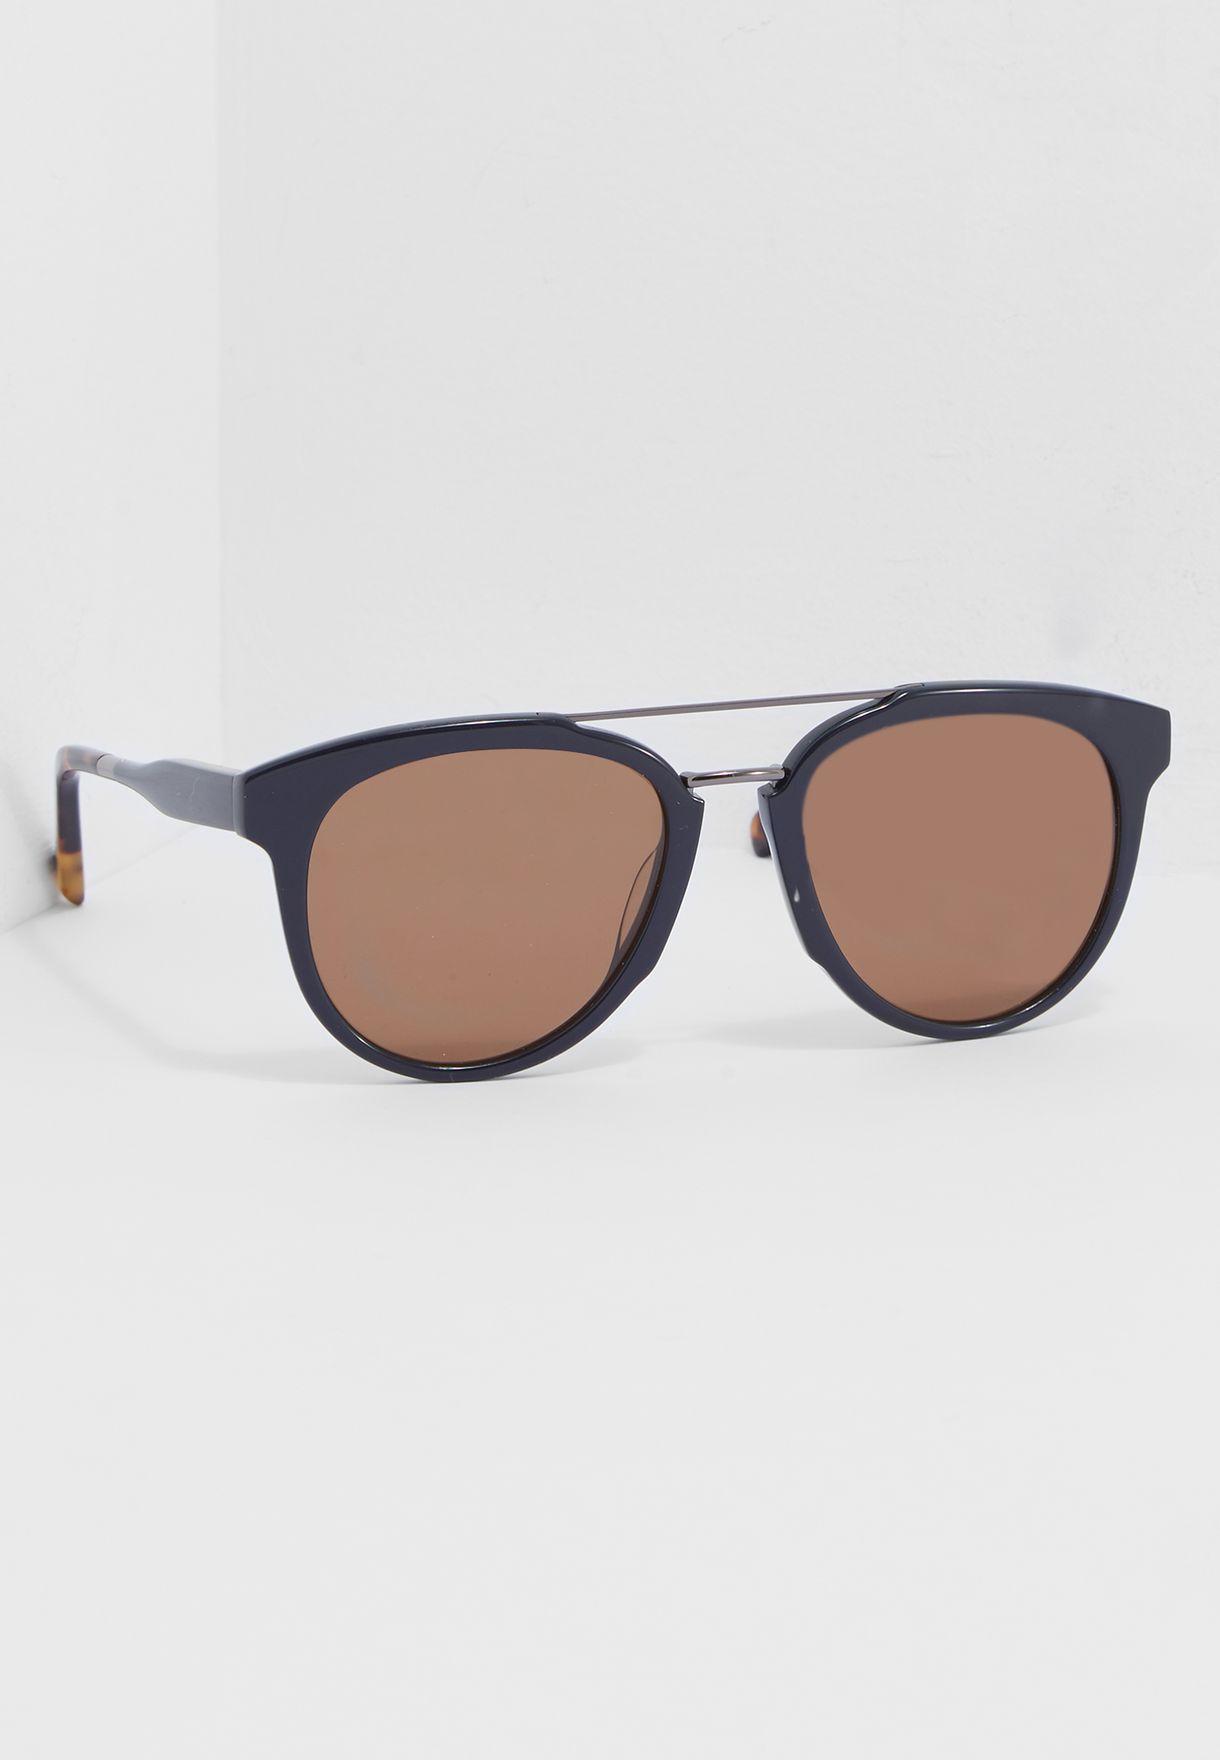 df3cd4f9d75 Shop Salvatore ferragamo navy Casual Sunglasses SF865S-414 for Men in Kuwait  - SA277AC60UTJ